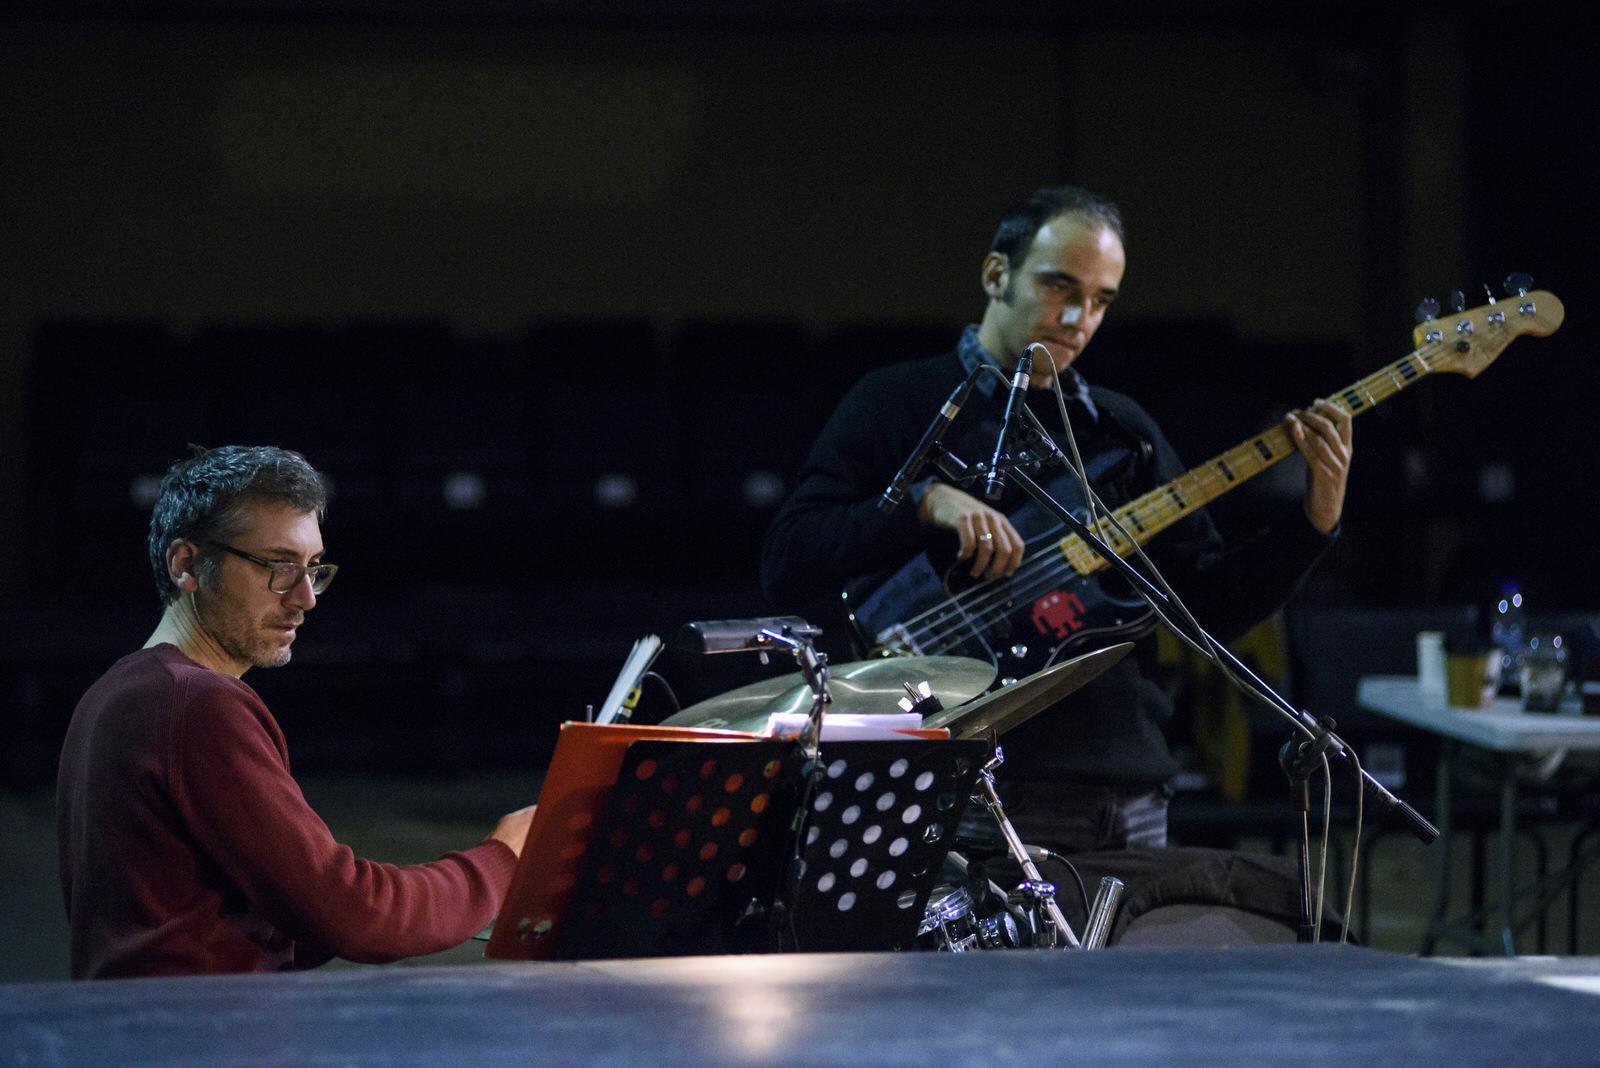 ChrisCarol musicians